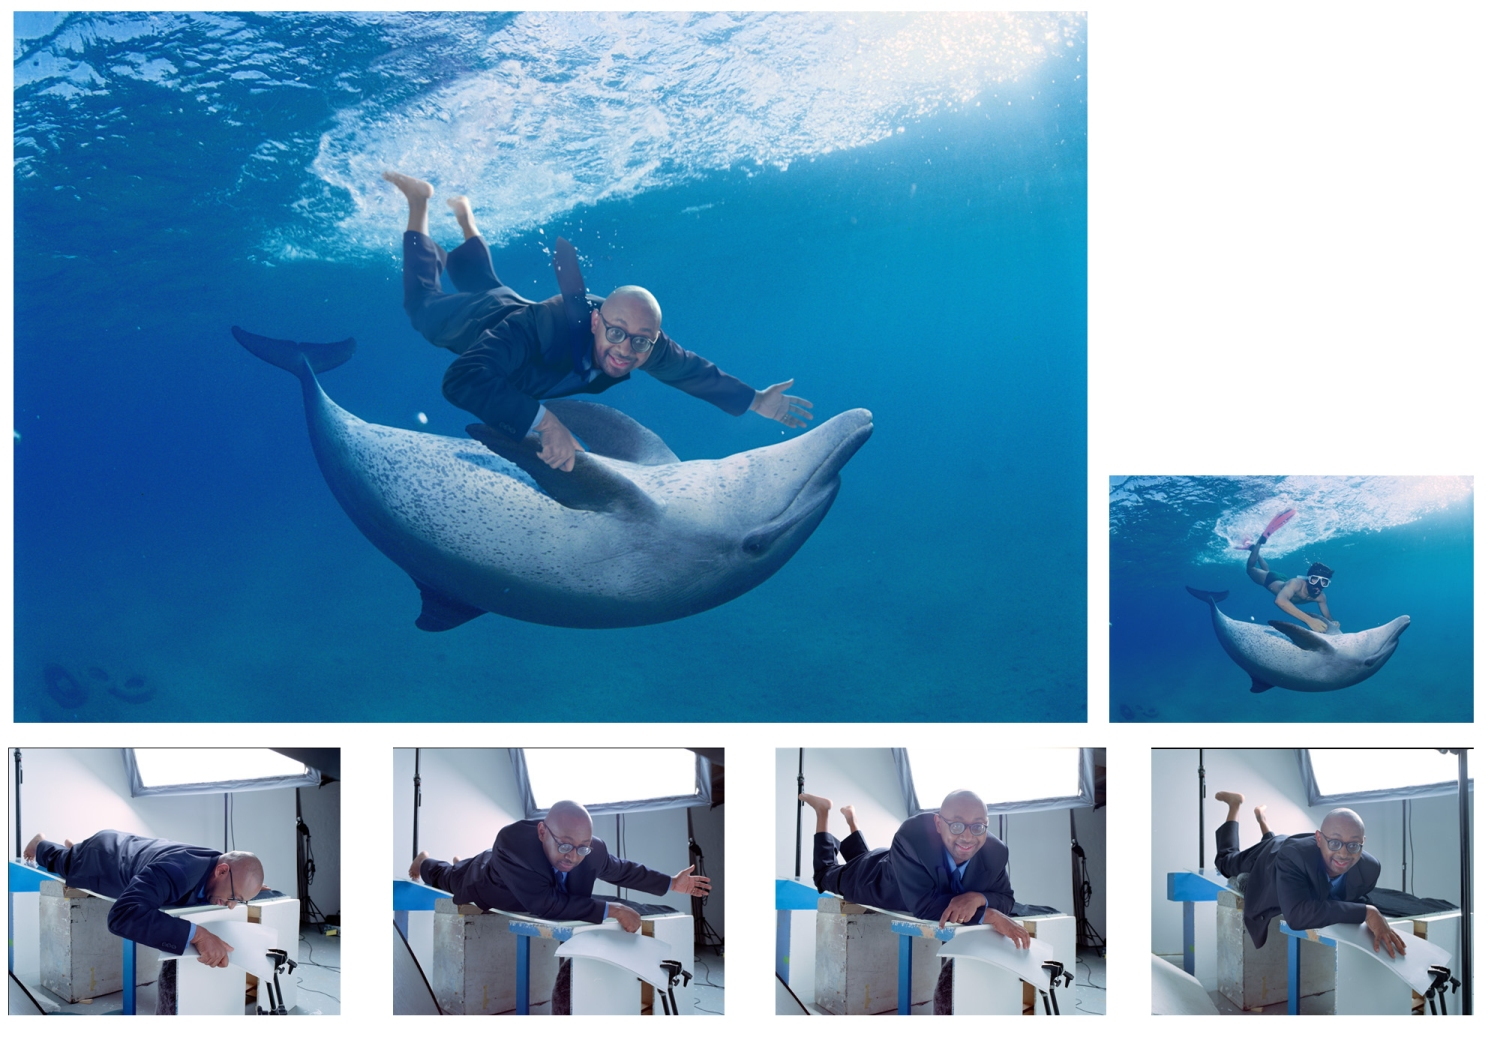 halifax-dolphin_agency_dlkw 2